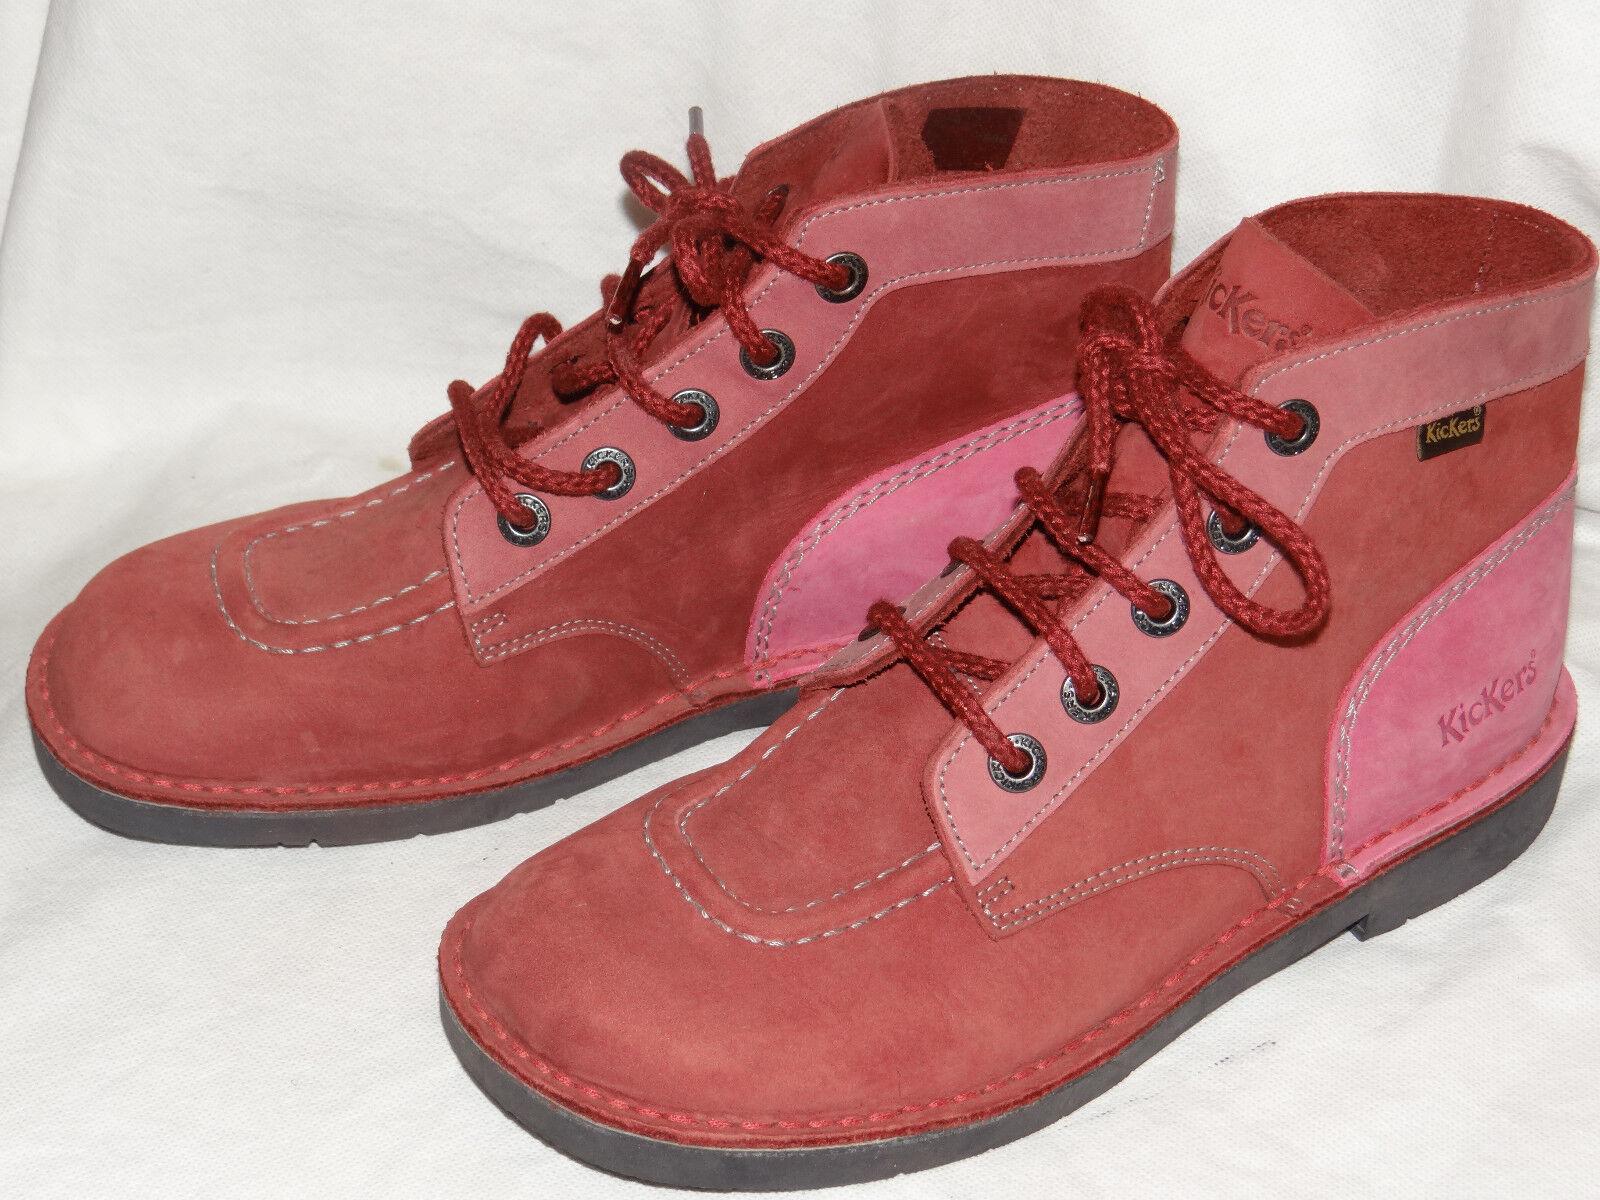 Original Schuhe KICKERS Schuhe Original Stiefel Stiefel Gr.42 Wie Neu b73123